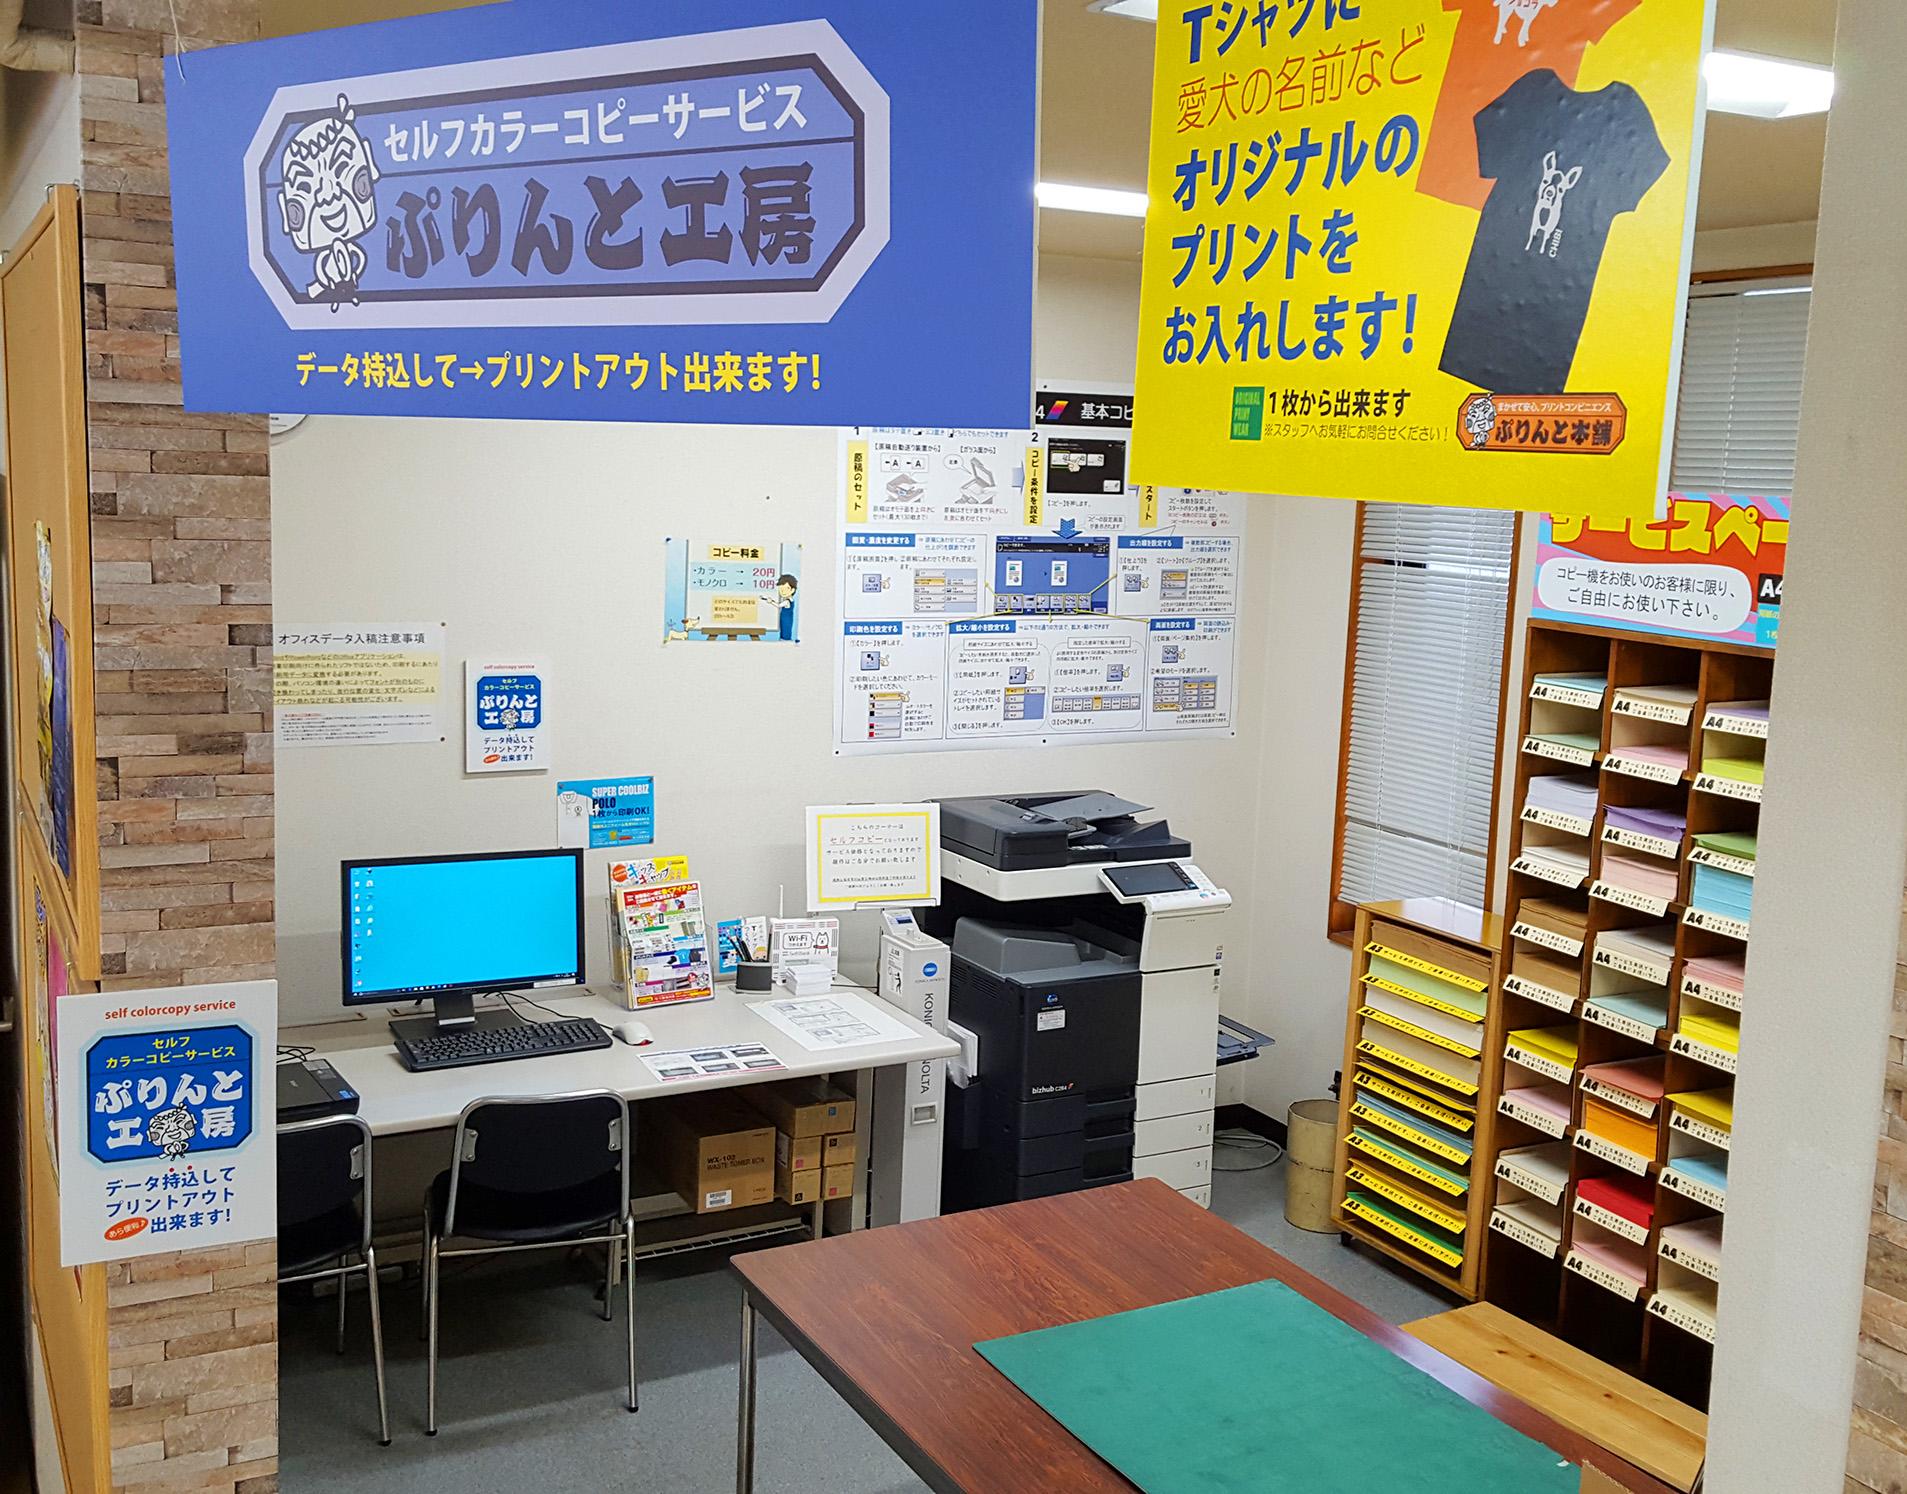 A3カラーコピー20円!